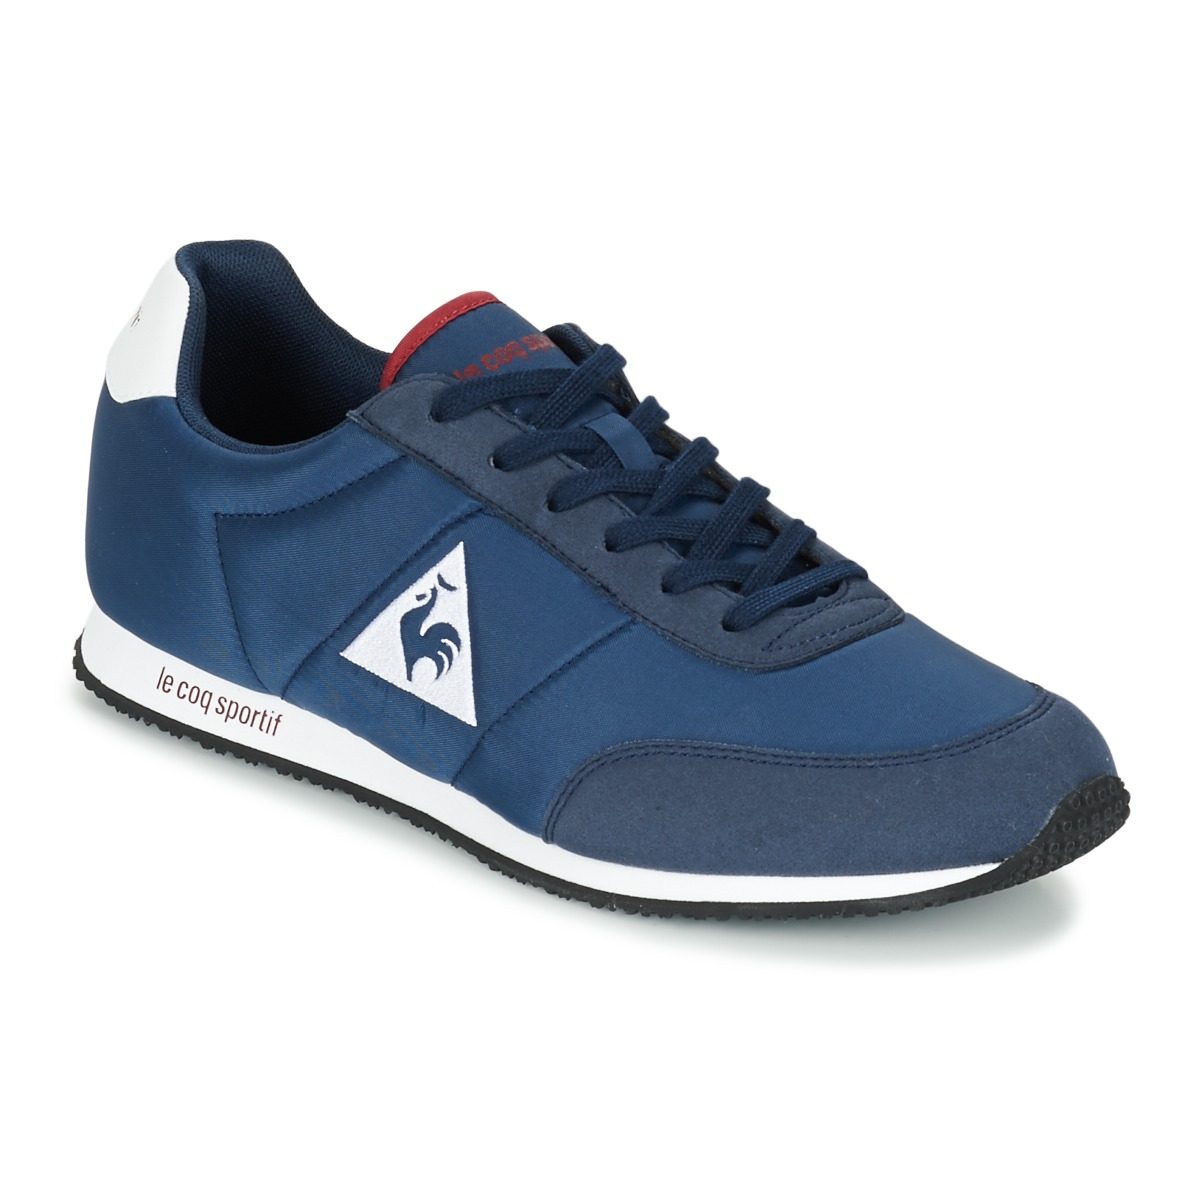 Le Coq Sportif RACERONE NYLON Blau - Kostenloser Versand bei Spartoode ! - Schuhe Sneaker Low Herren 48,99 €